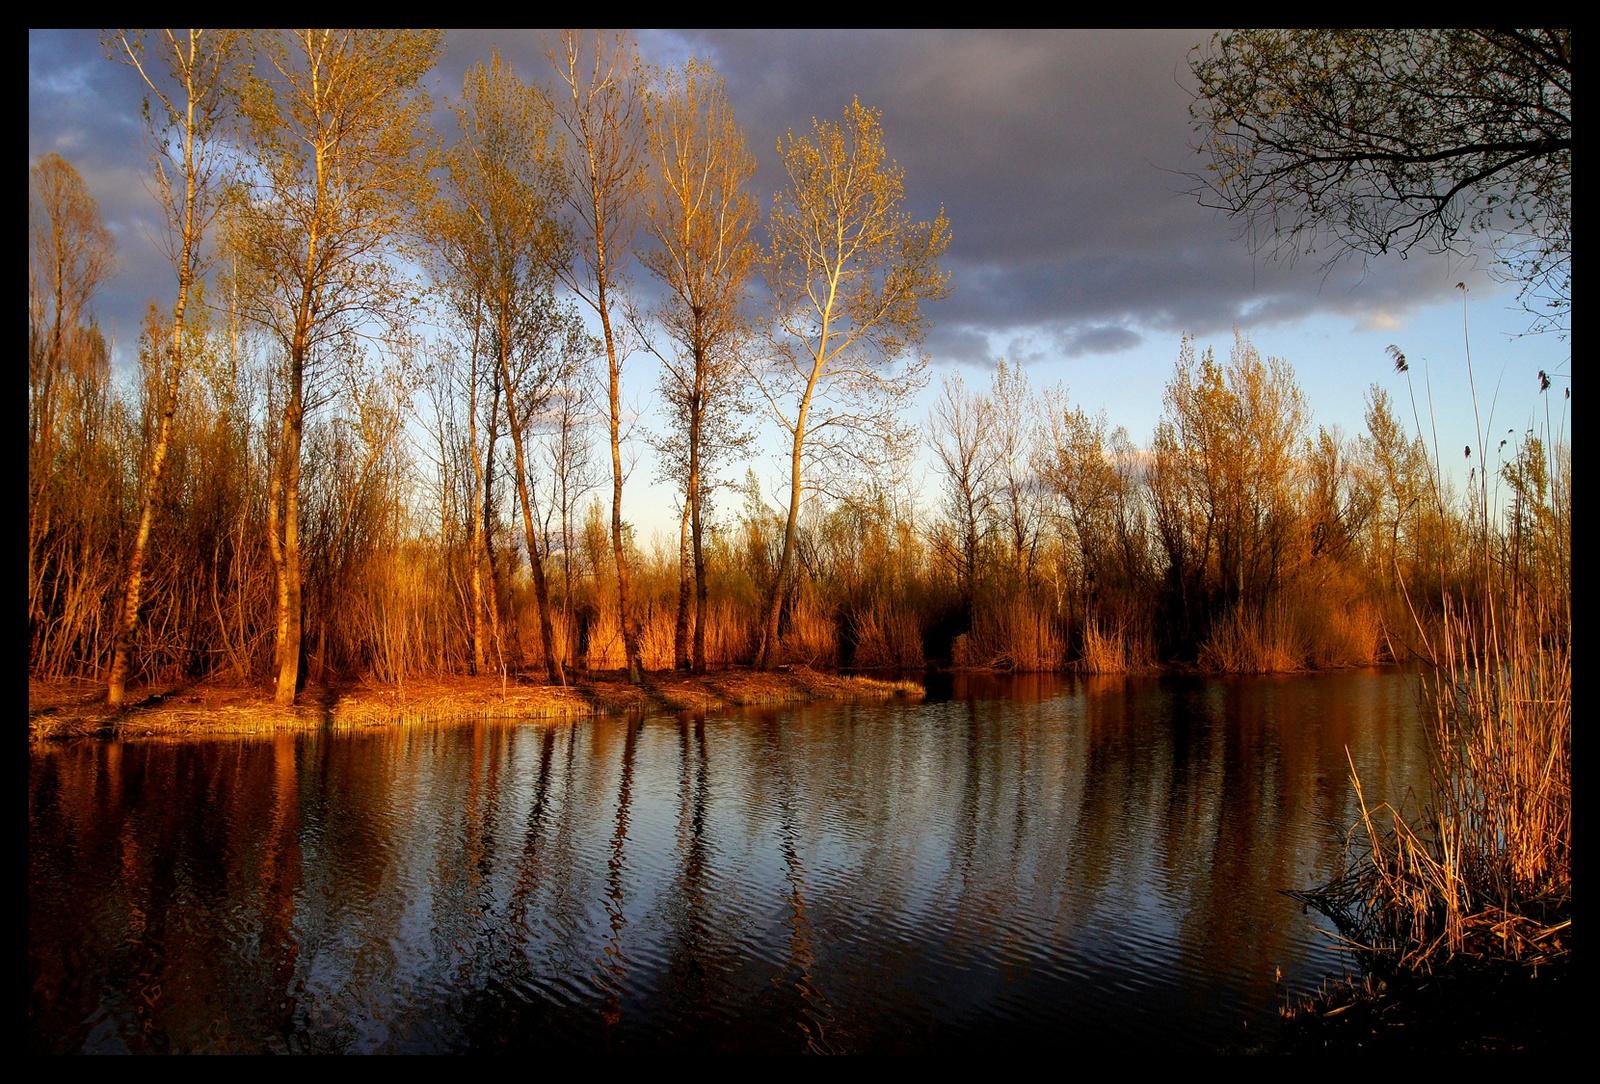 Fák a tóparton